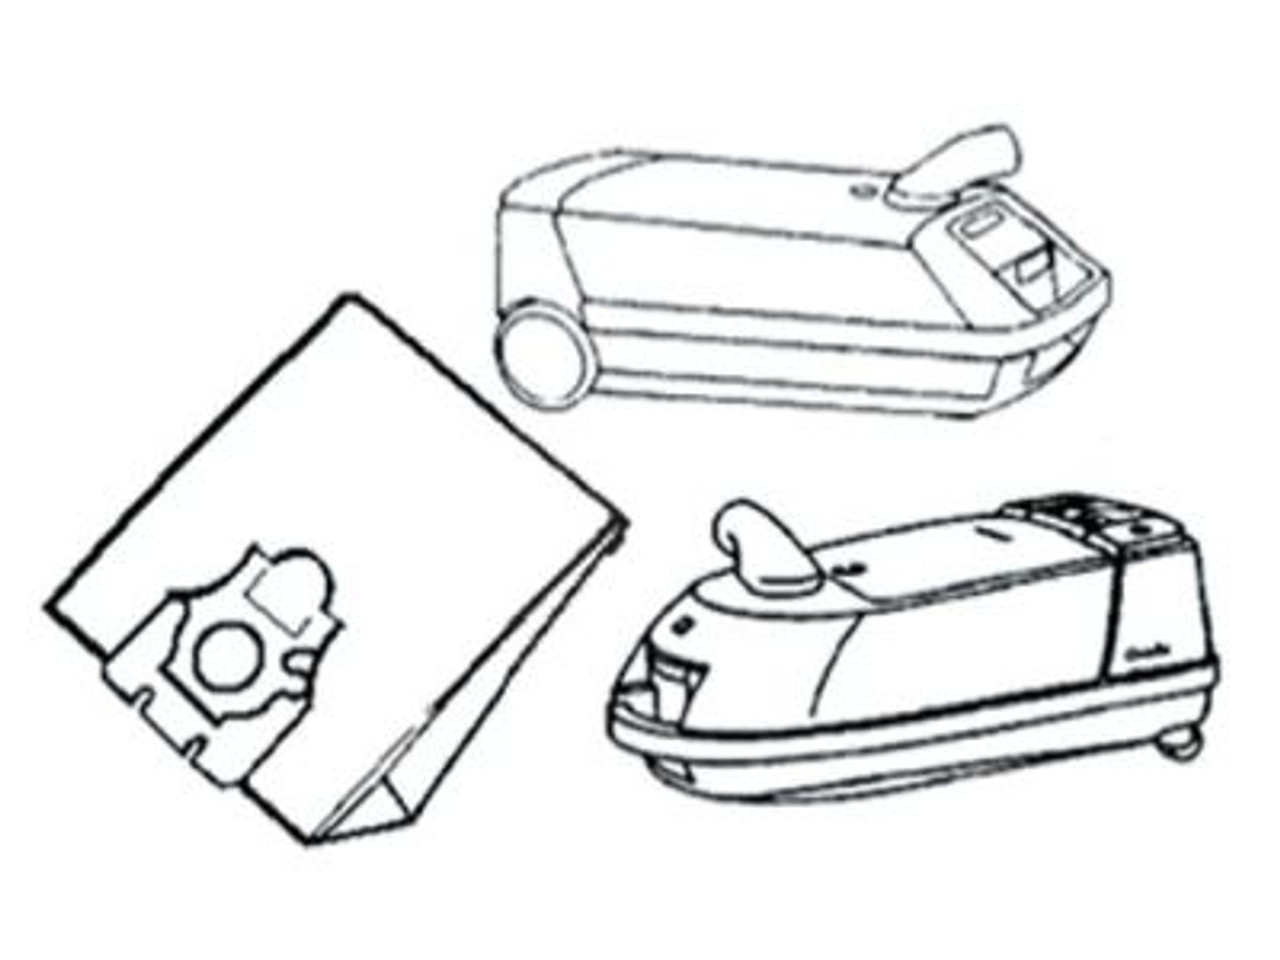 Miele S227-S290 Vacuum Cleaner Bags - SDB153